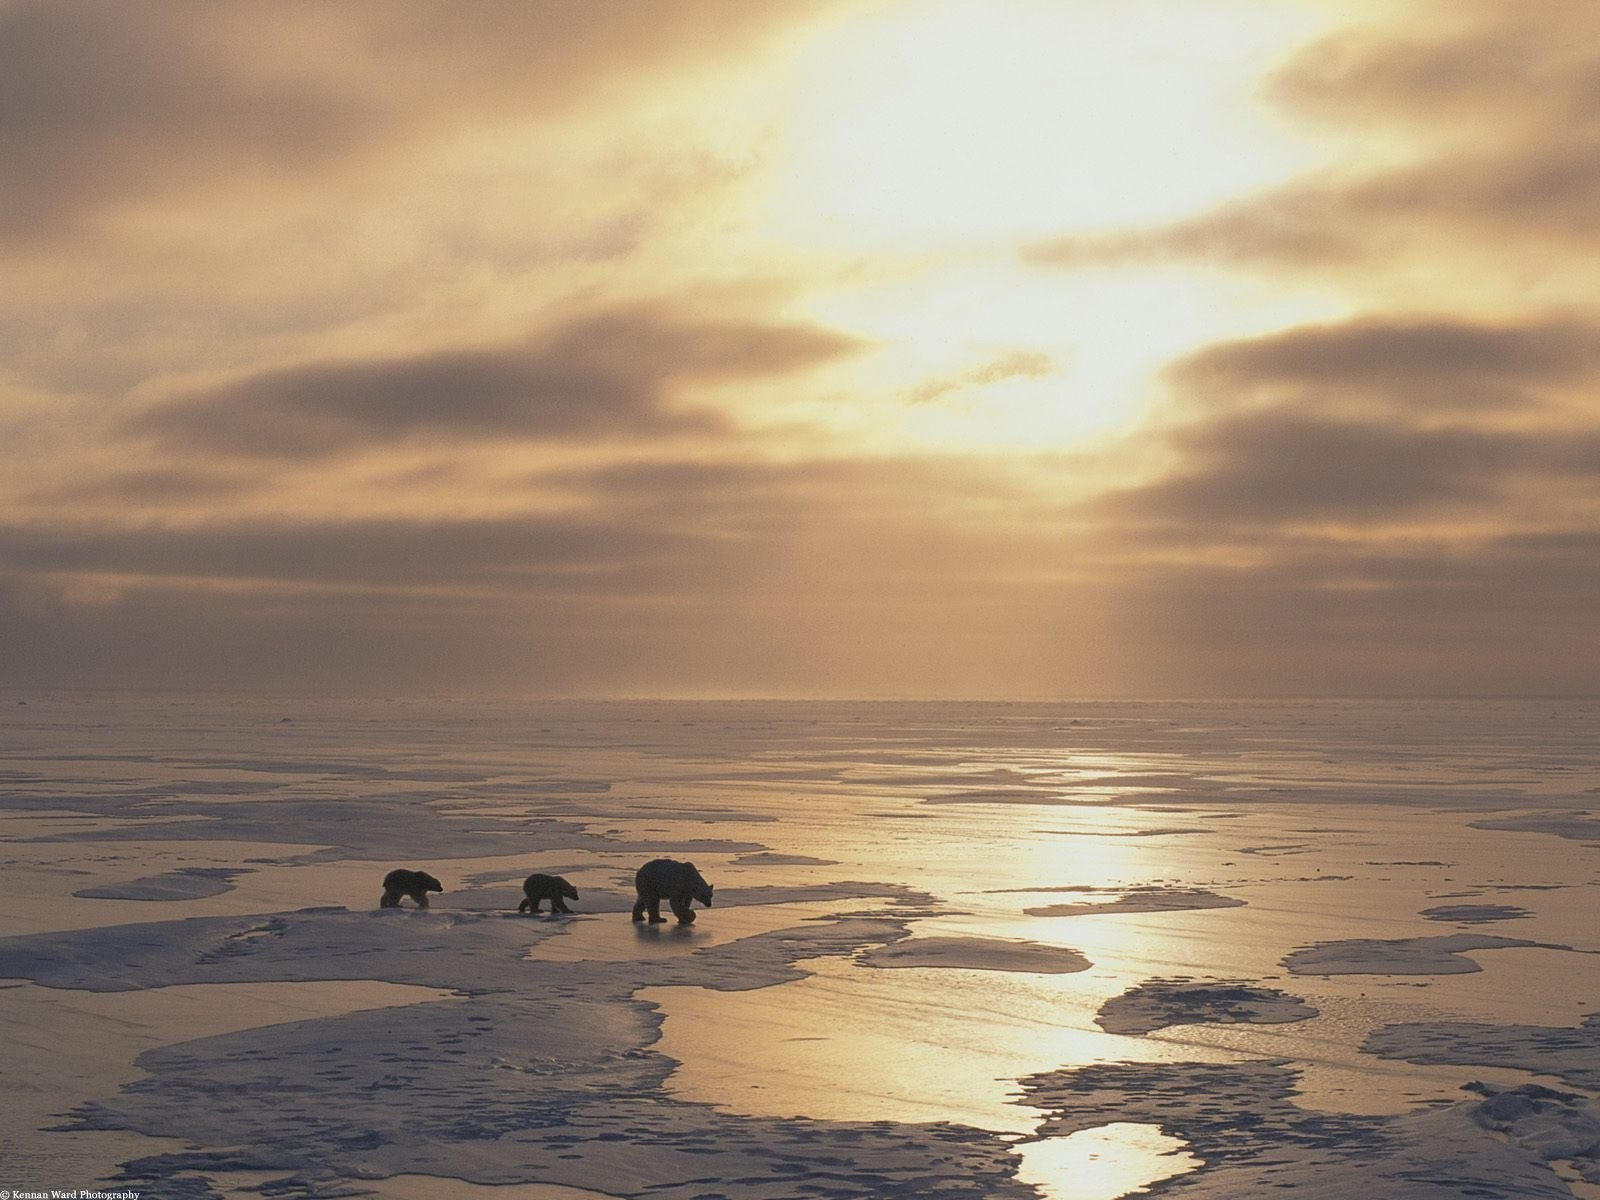 Медведи идут по замершему морю